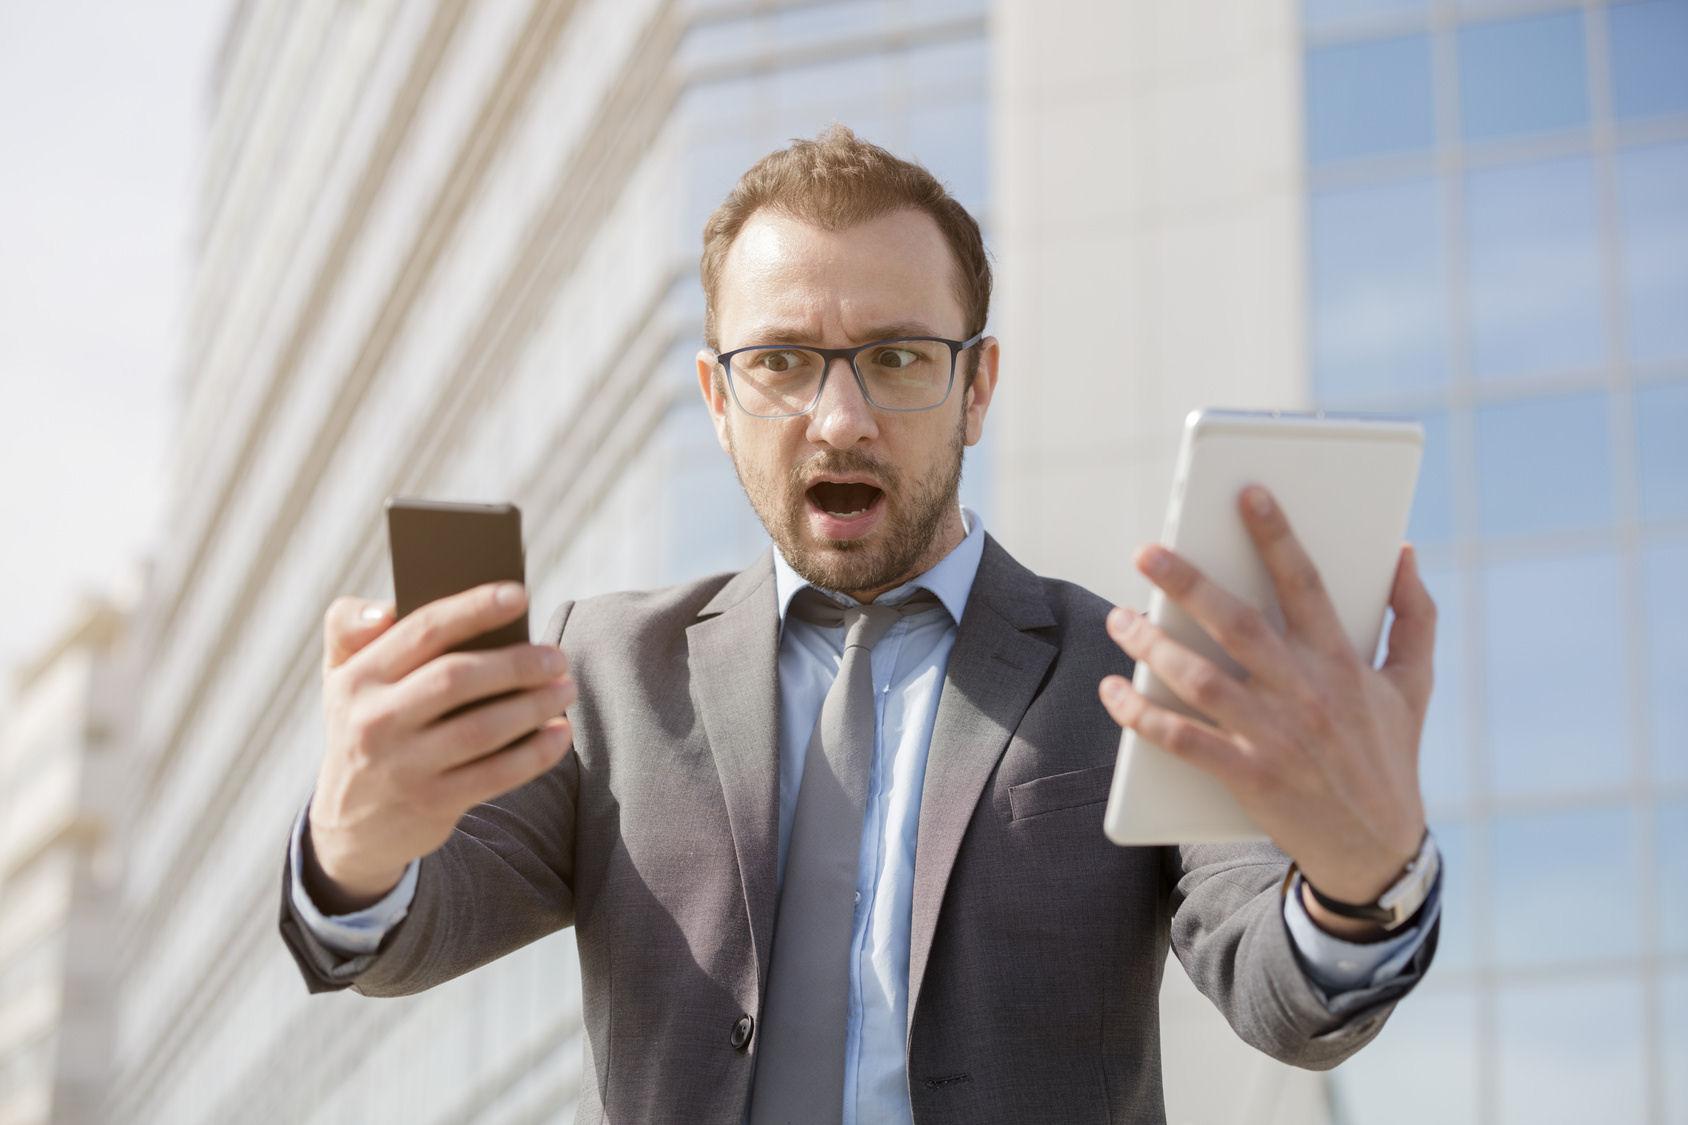 smartphone-device-confusion